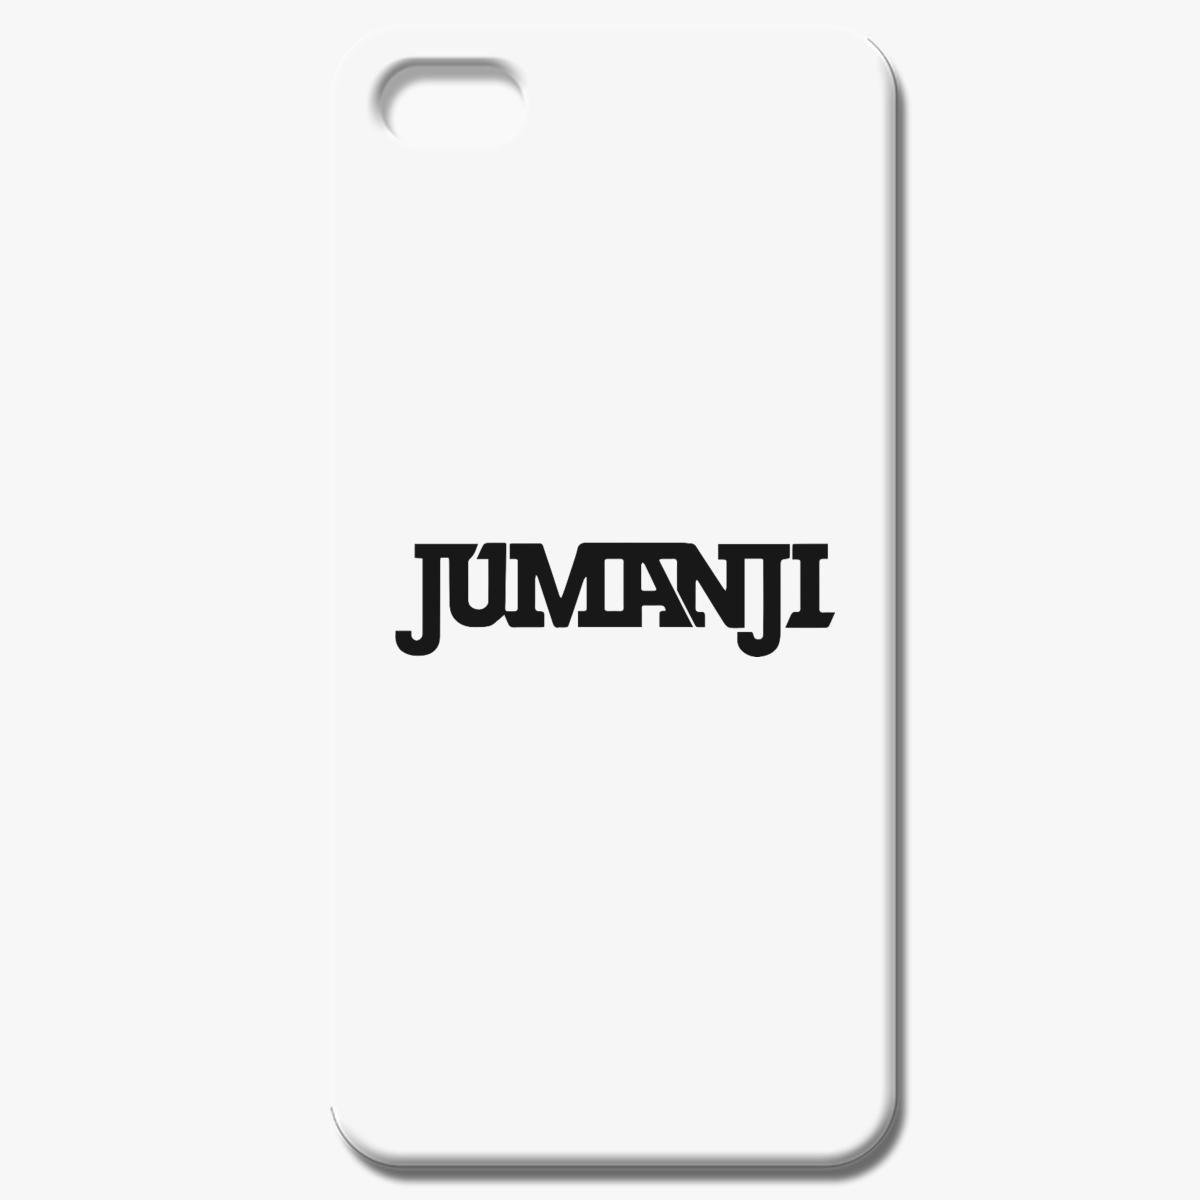 Jumanji Iphone 8 Case